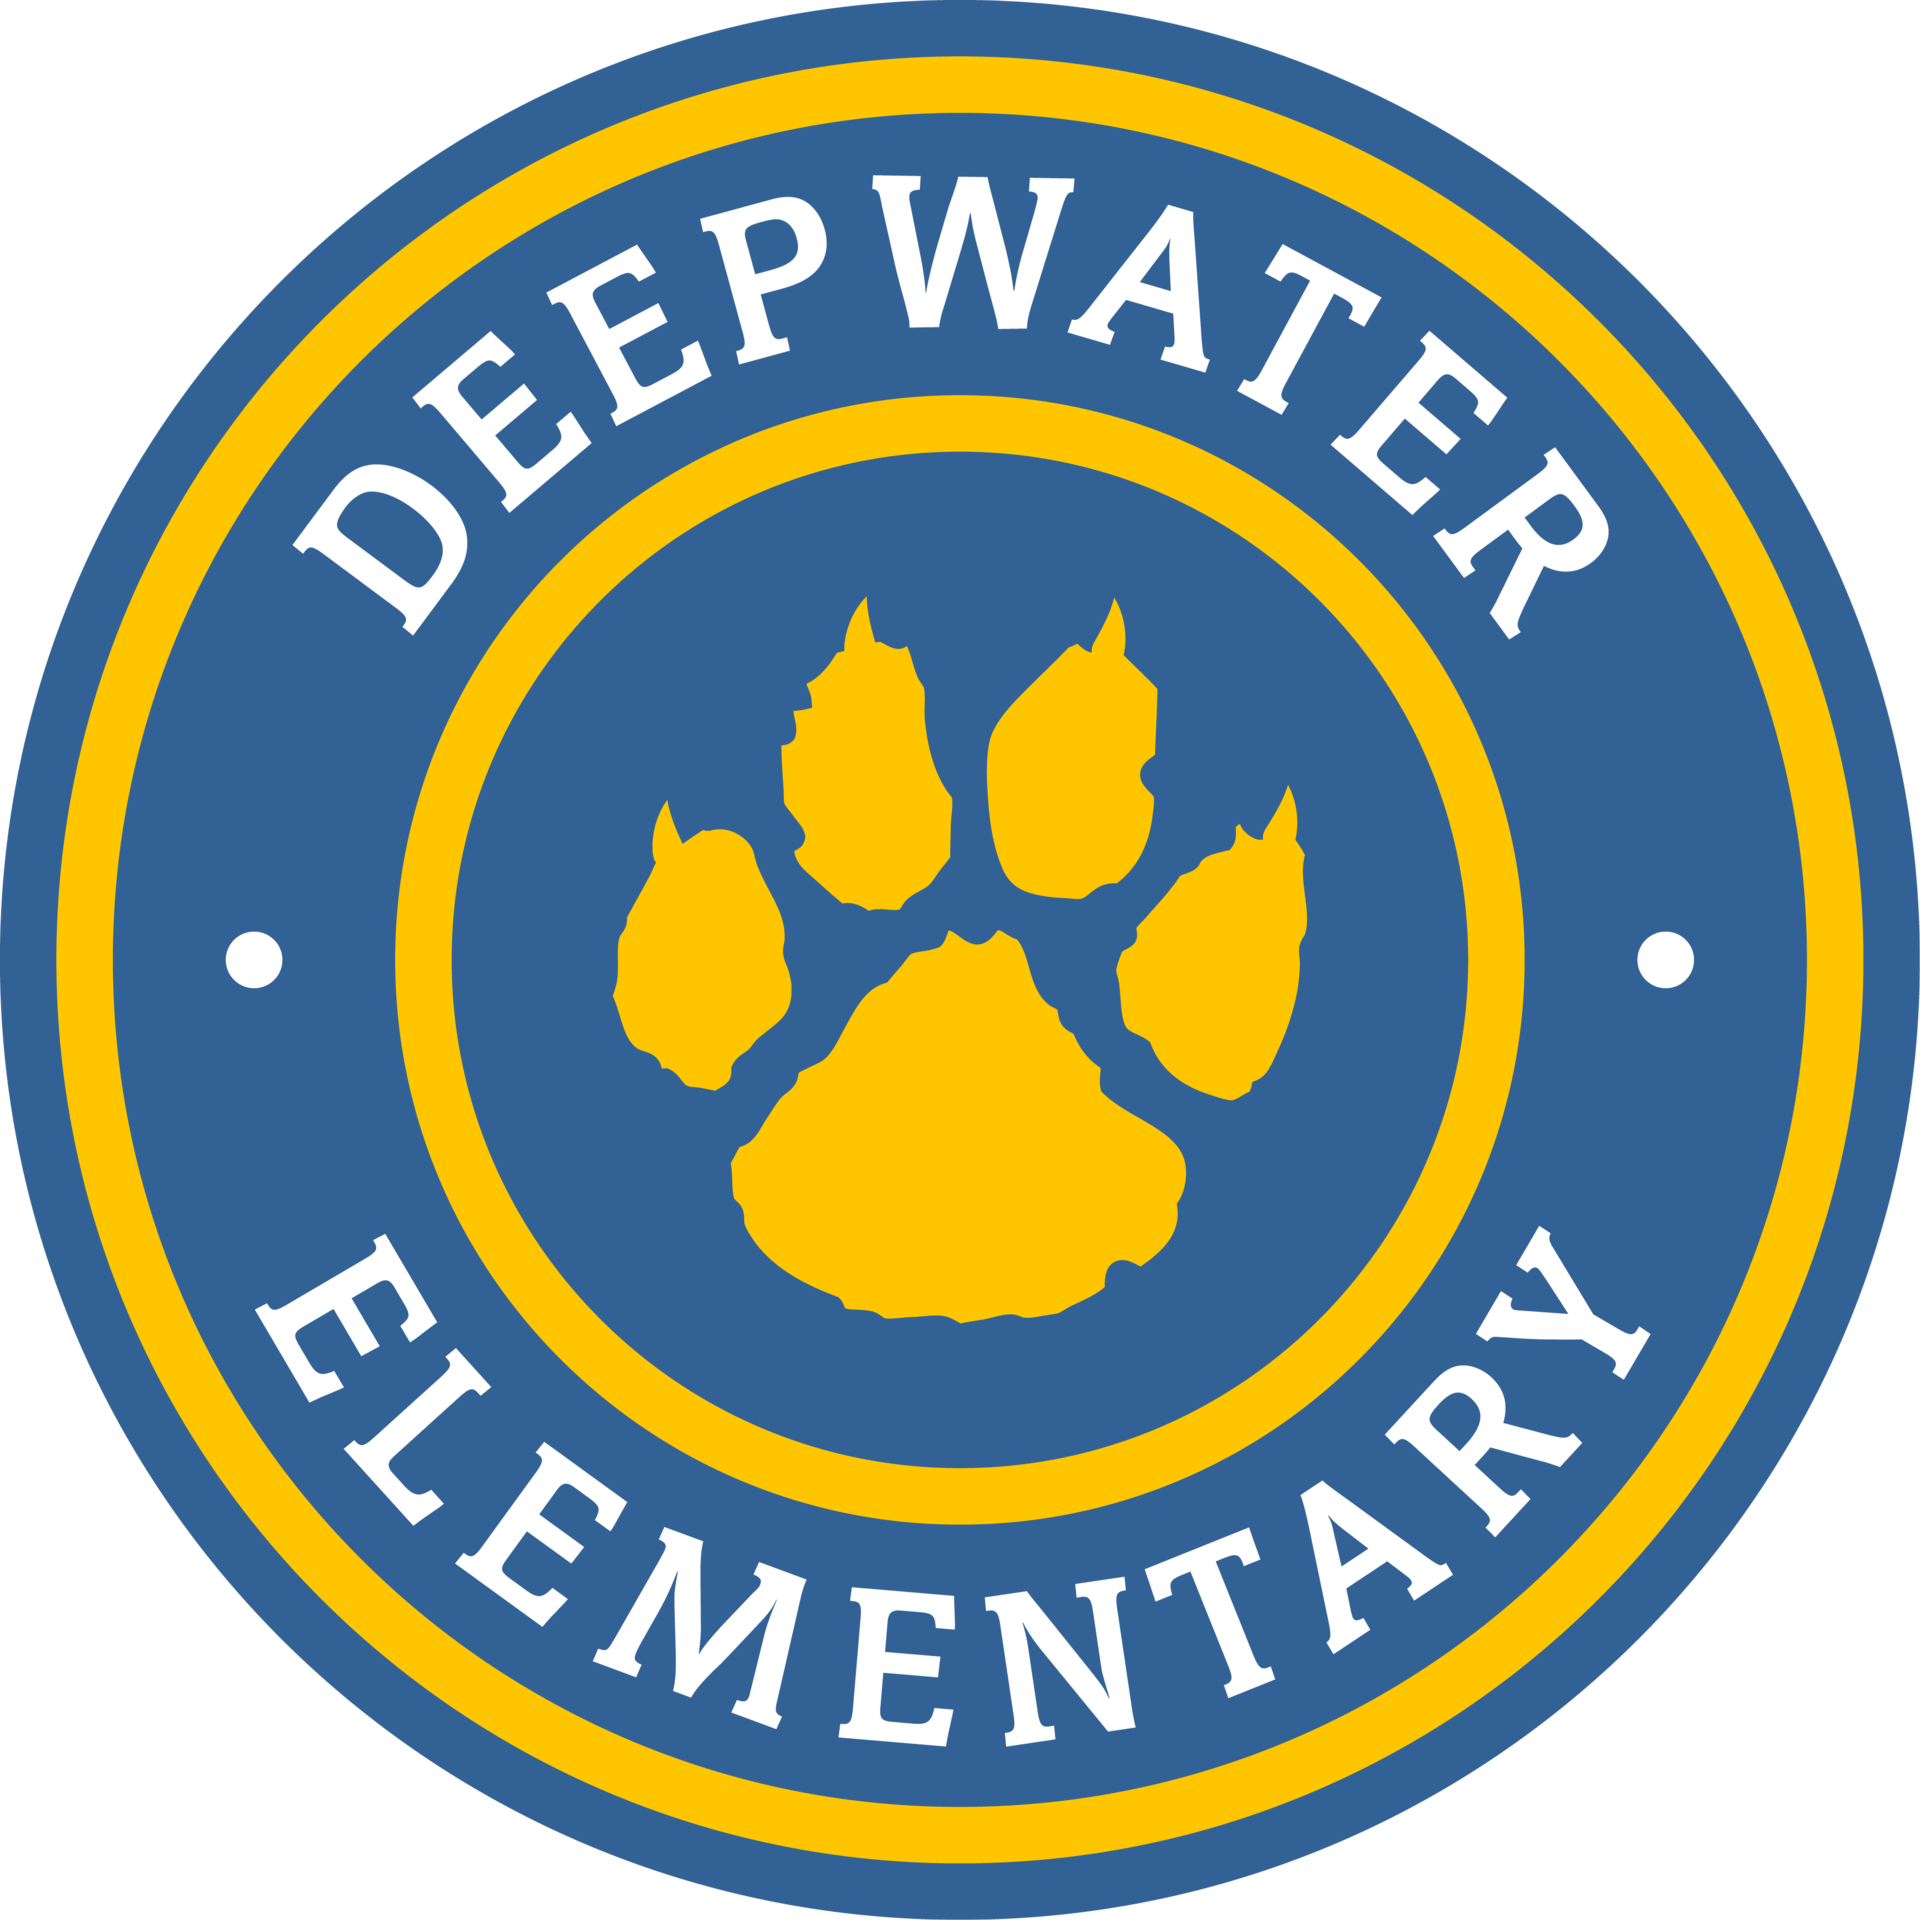 Deepwater Elementary school seal